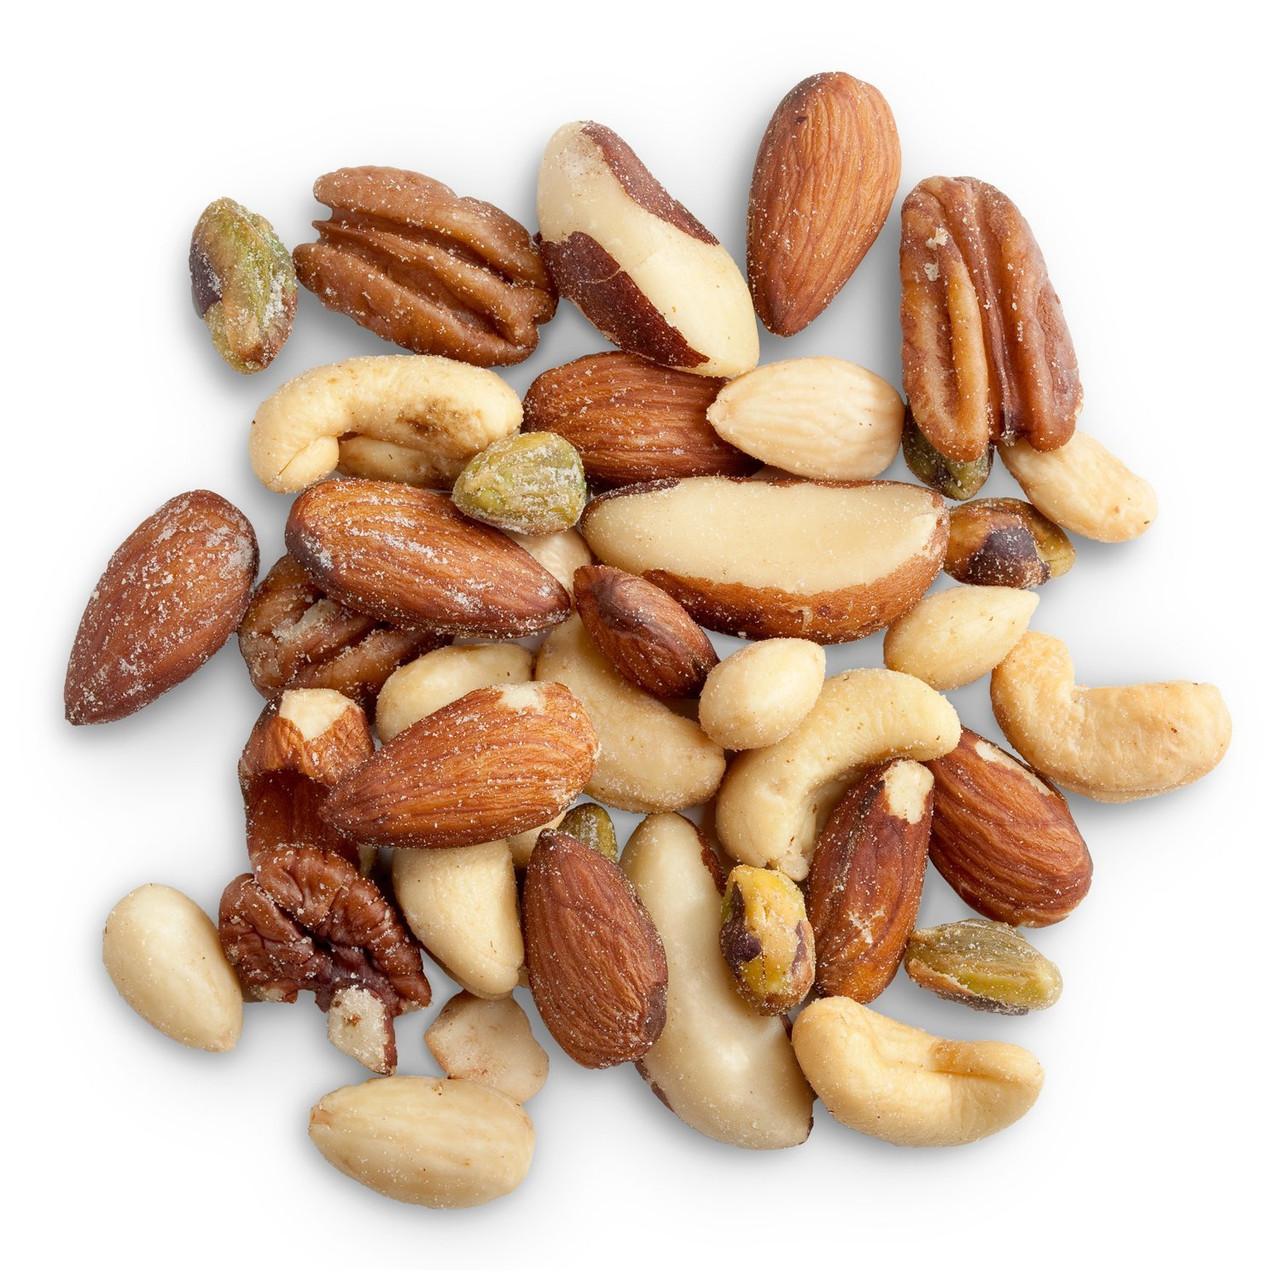 Nutty Flavor